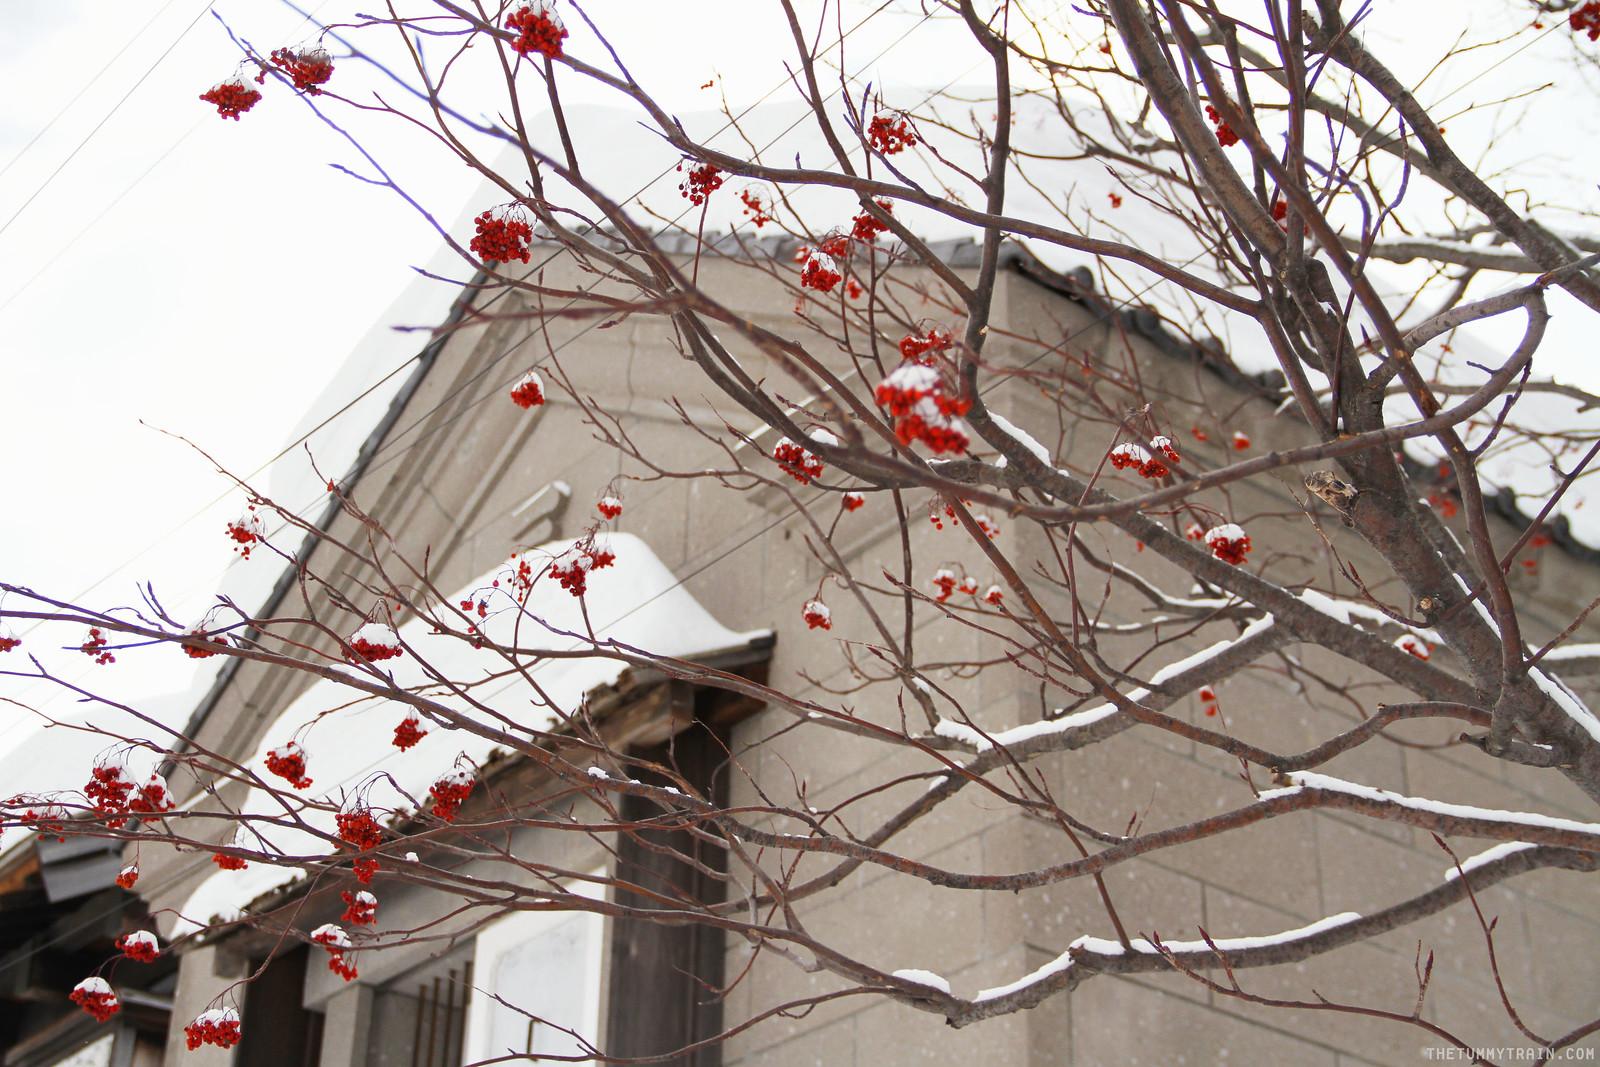 32877130386 9057907ce1 h - Sapporo Snow And Smile: 8 Unforgettable Winter Experiences in Sapporo City